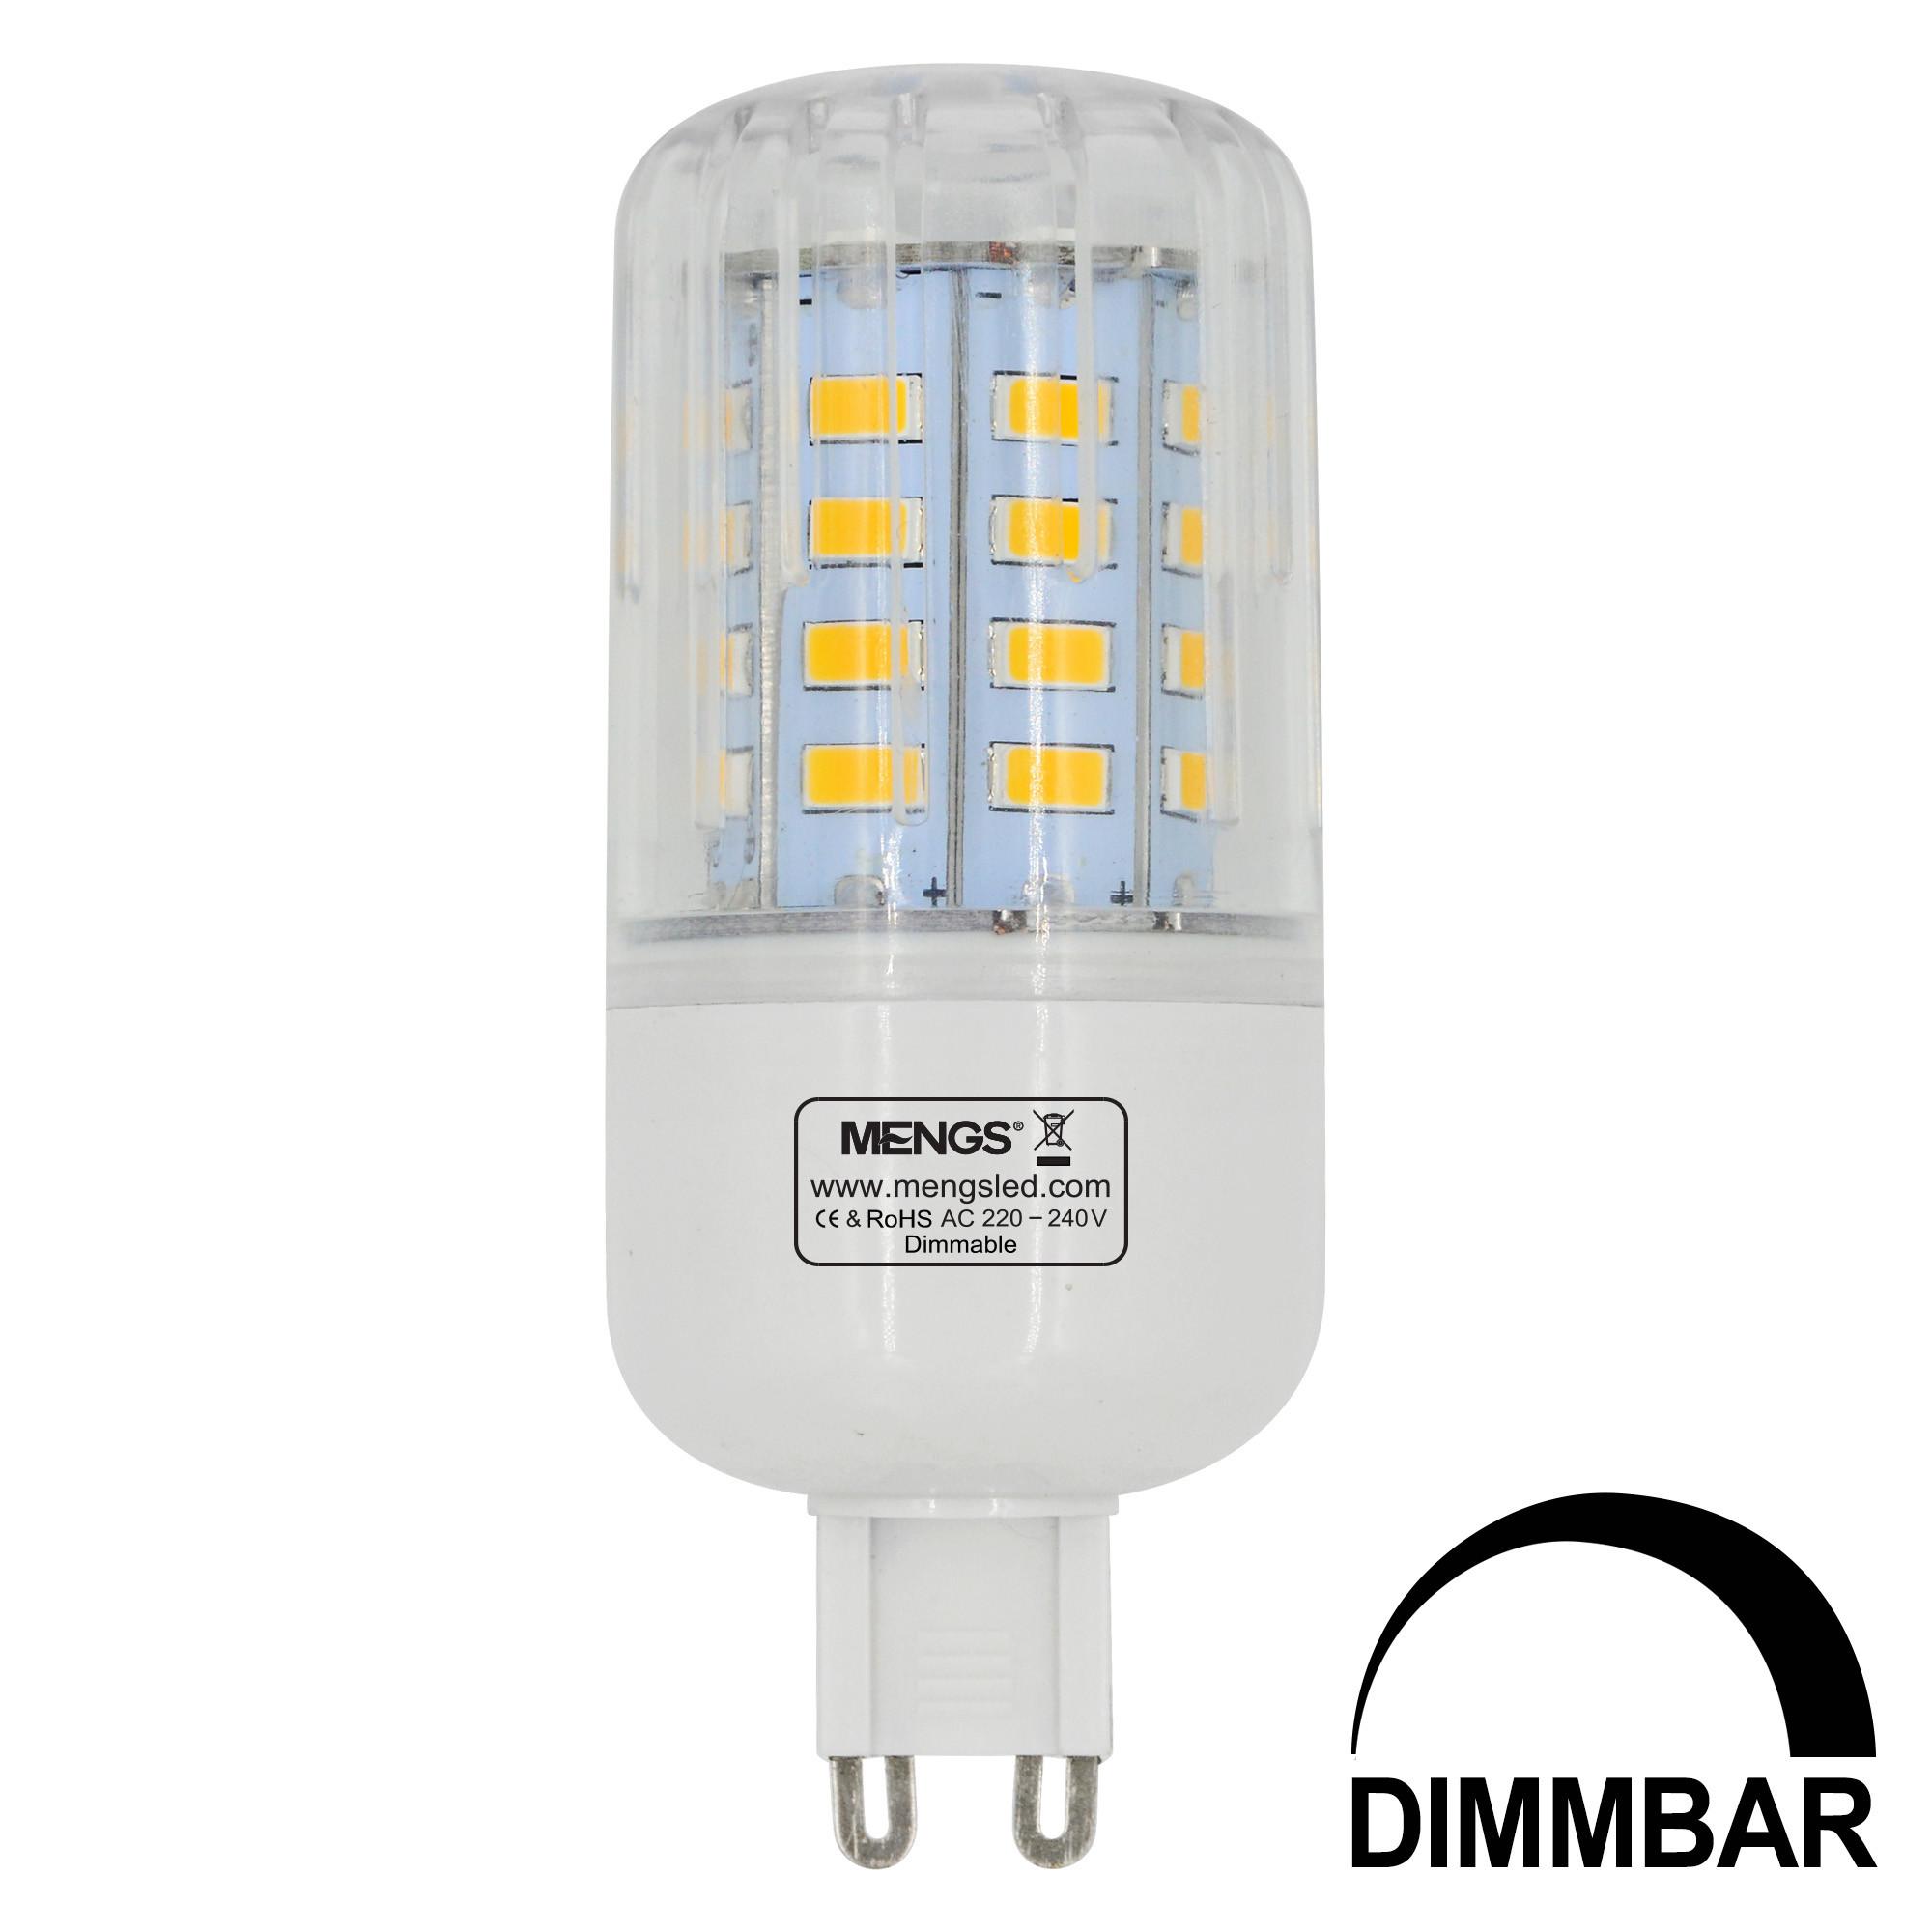 MENGS® G9 5W LED Dimmable Corn Light 40x 5736 SMD LED Bulb Lamp AC 220-240V In Warm White Energy-Saving Light